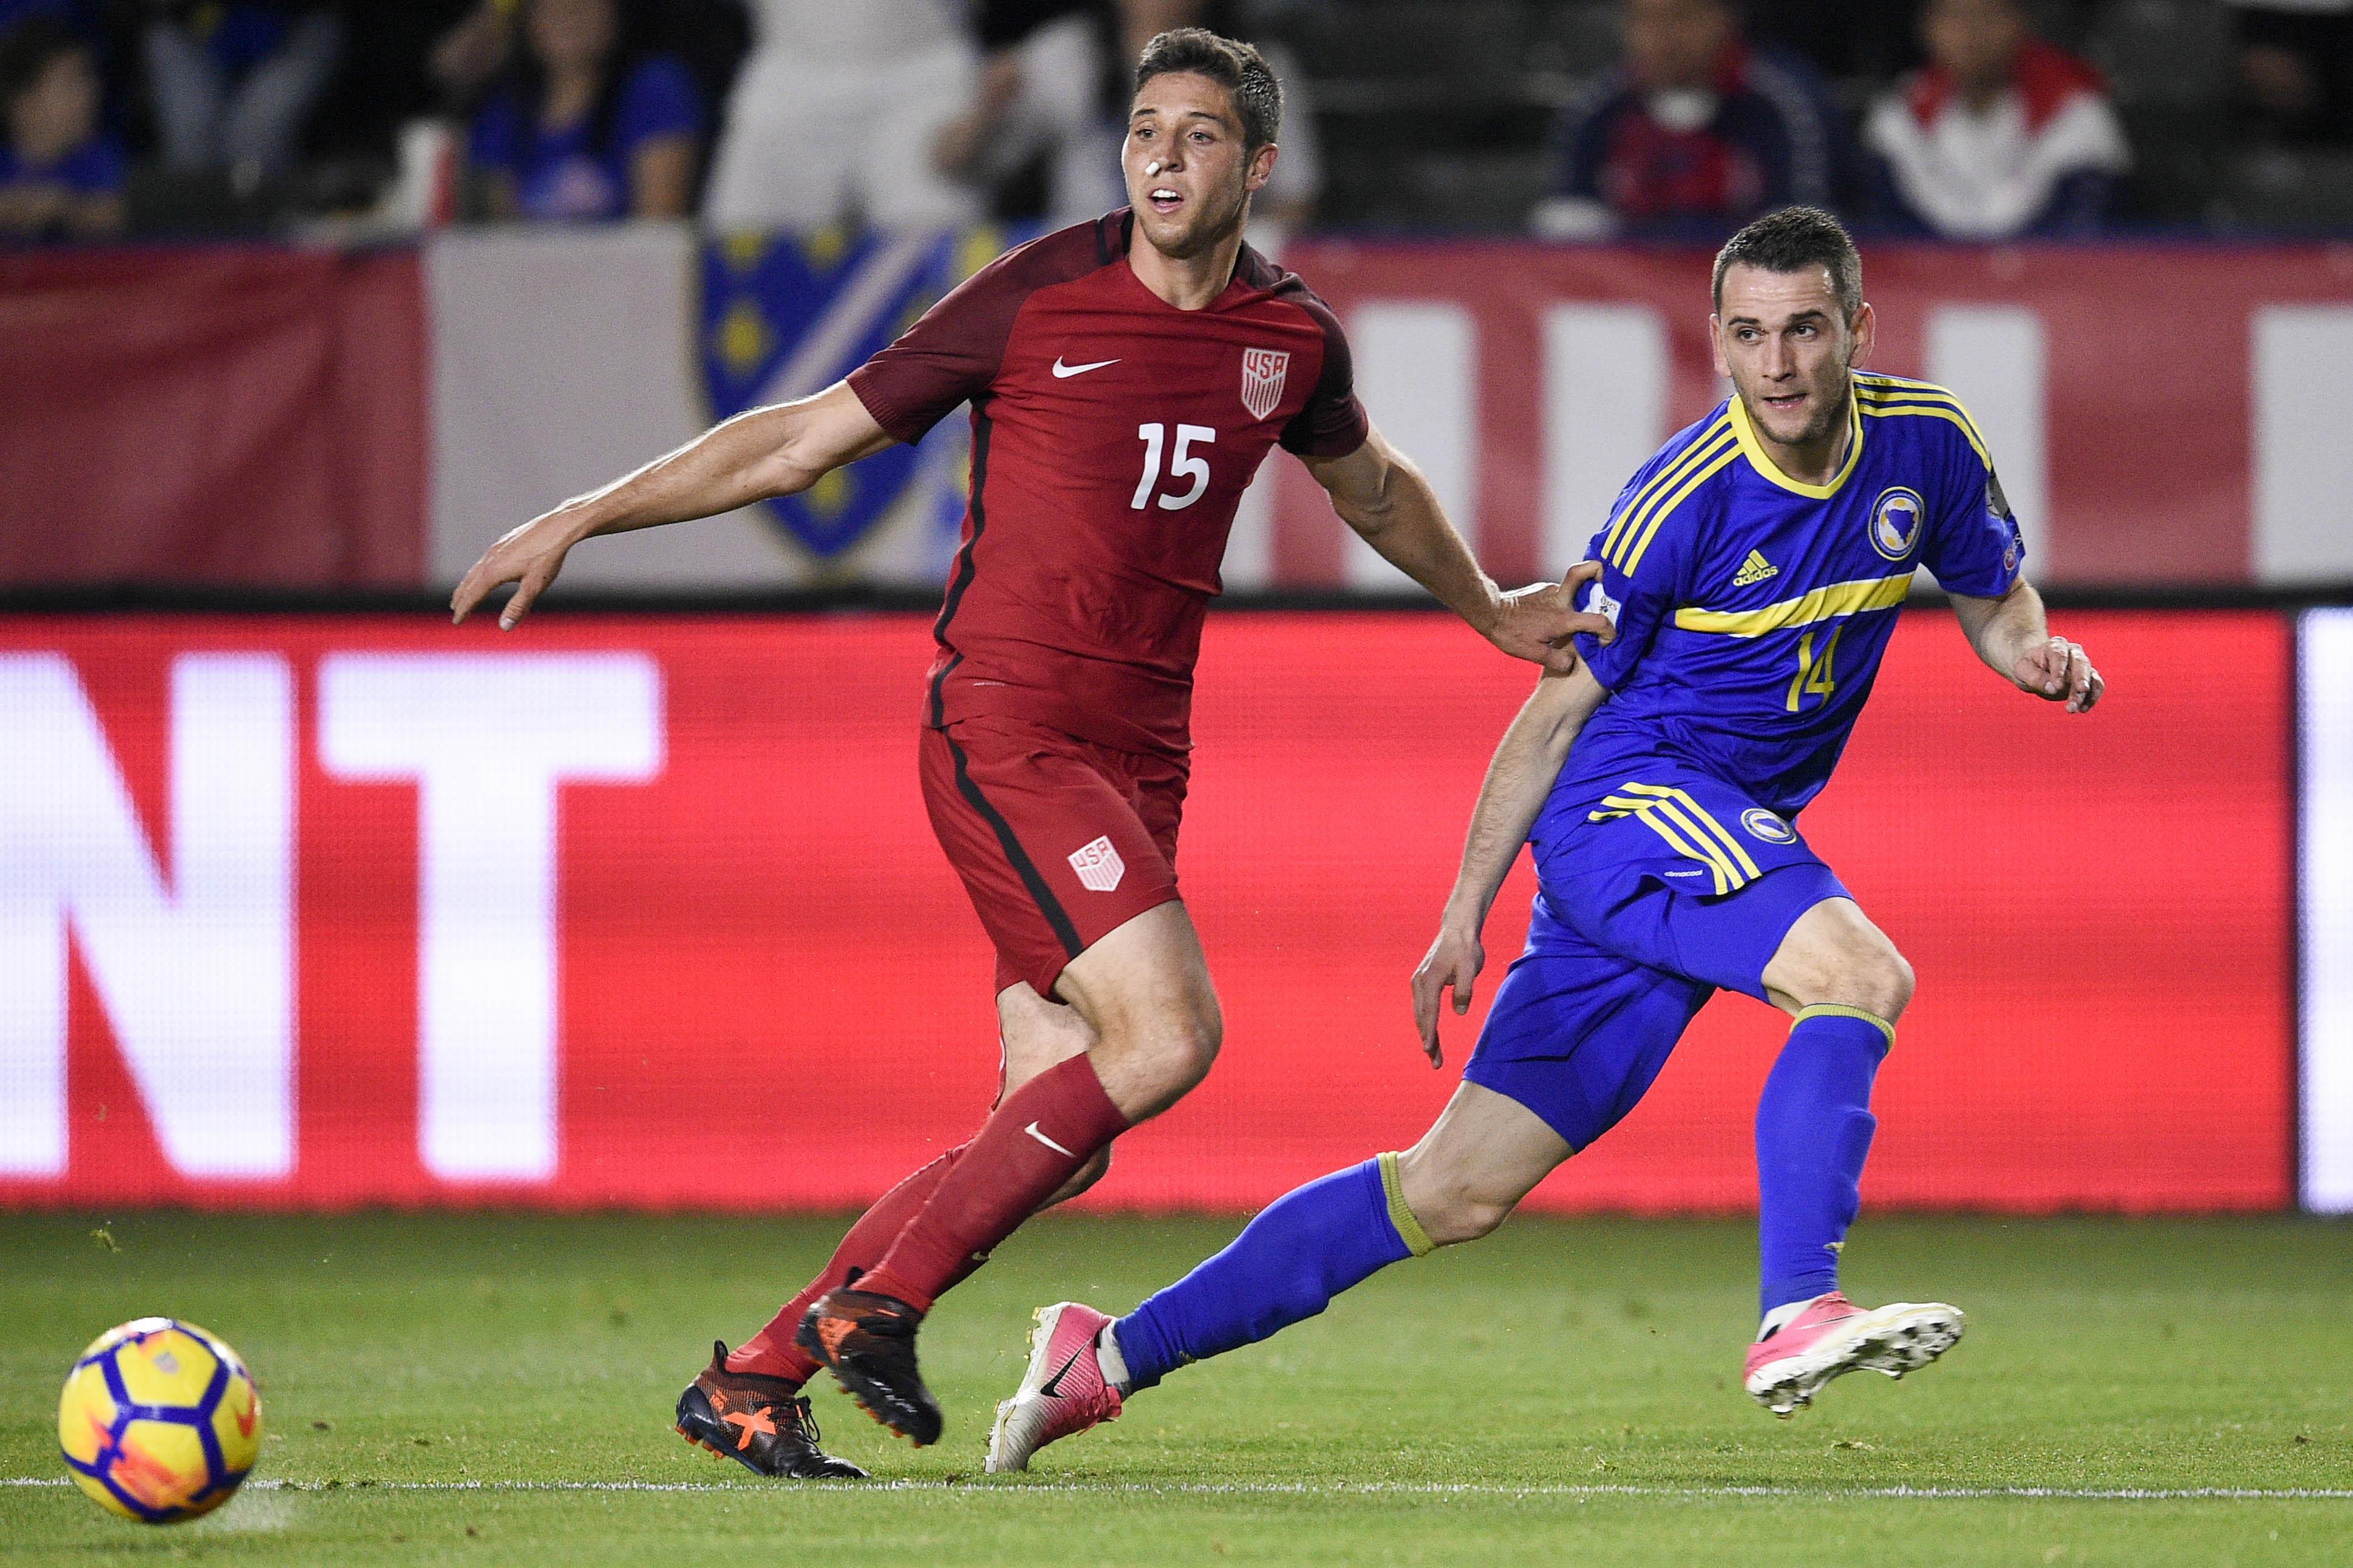 Soccer: International Friendly Soccer-Bosnia and Herzegovina  at USA